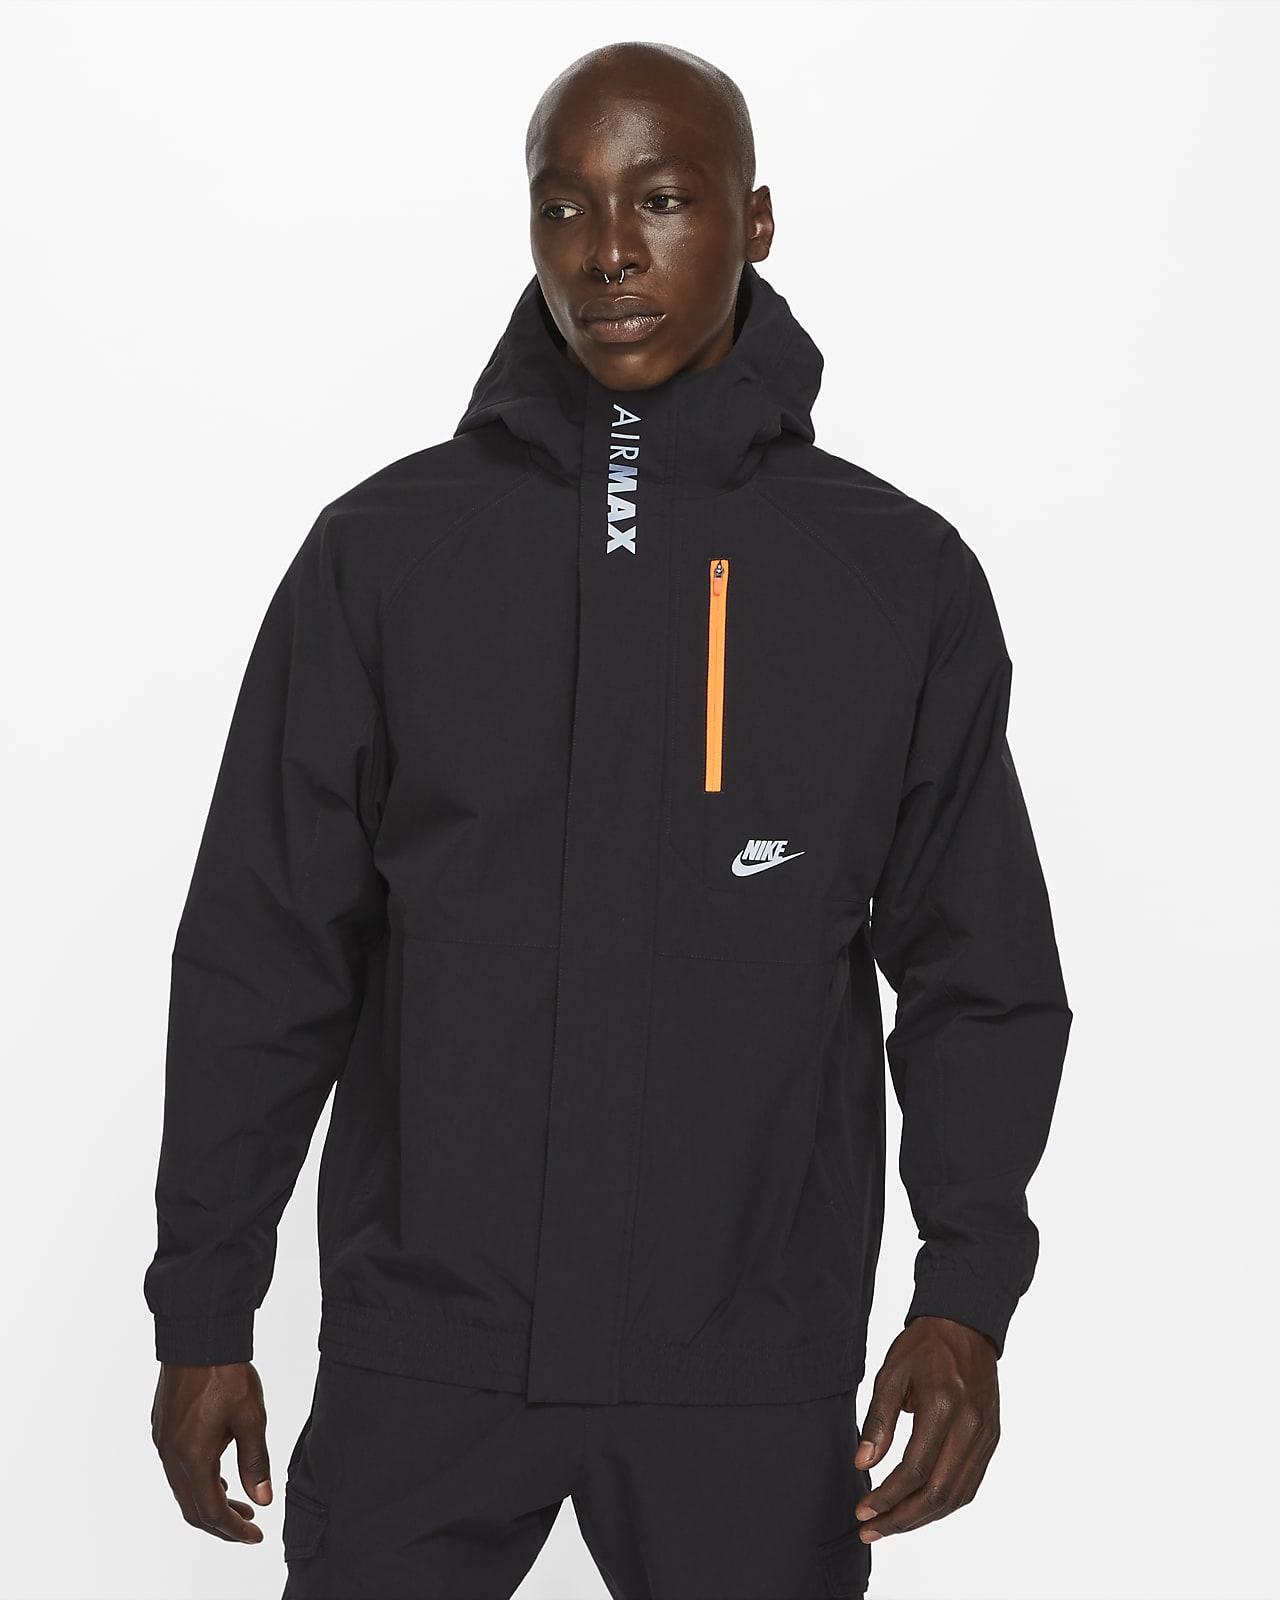 Nike Air Max Men's Woven Jacket